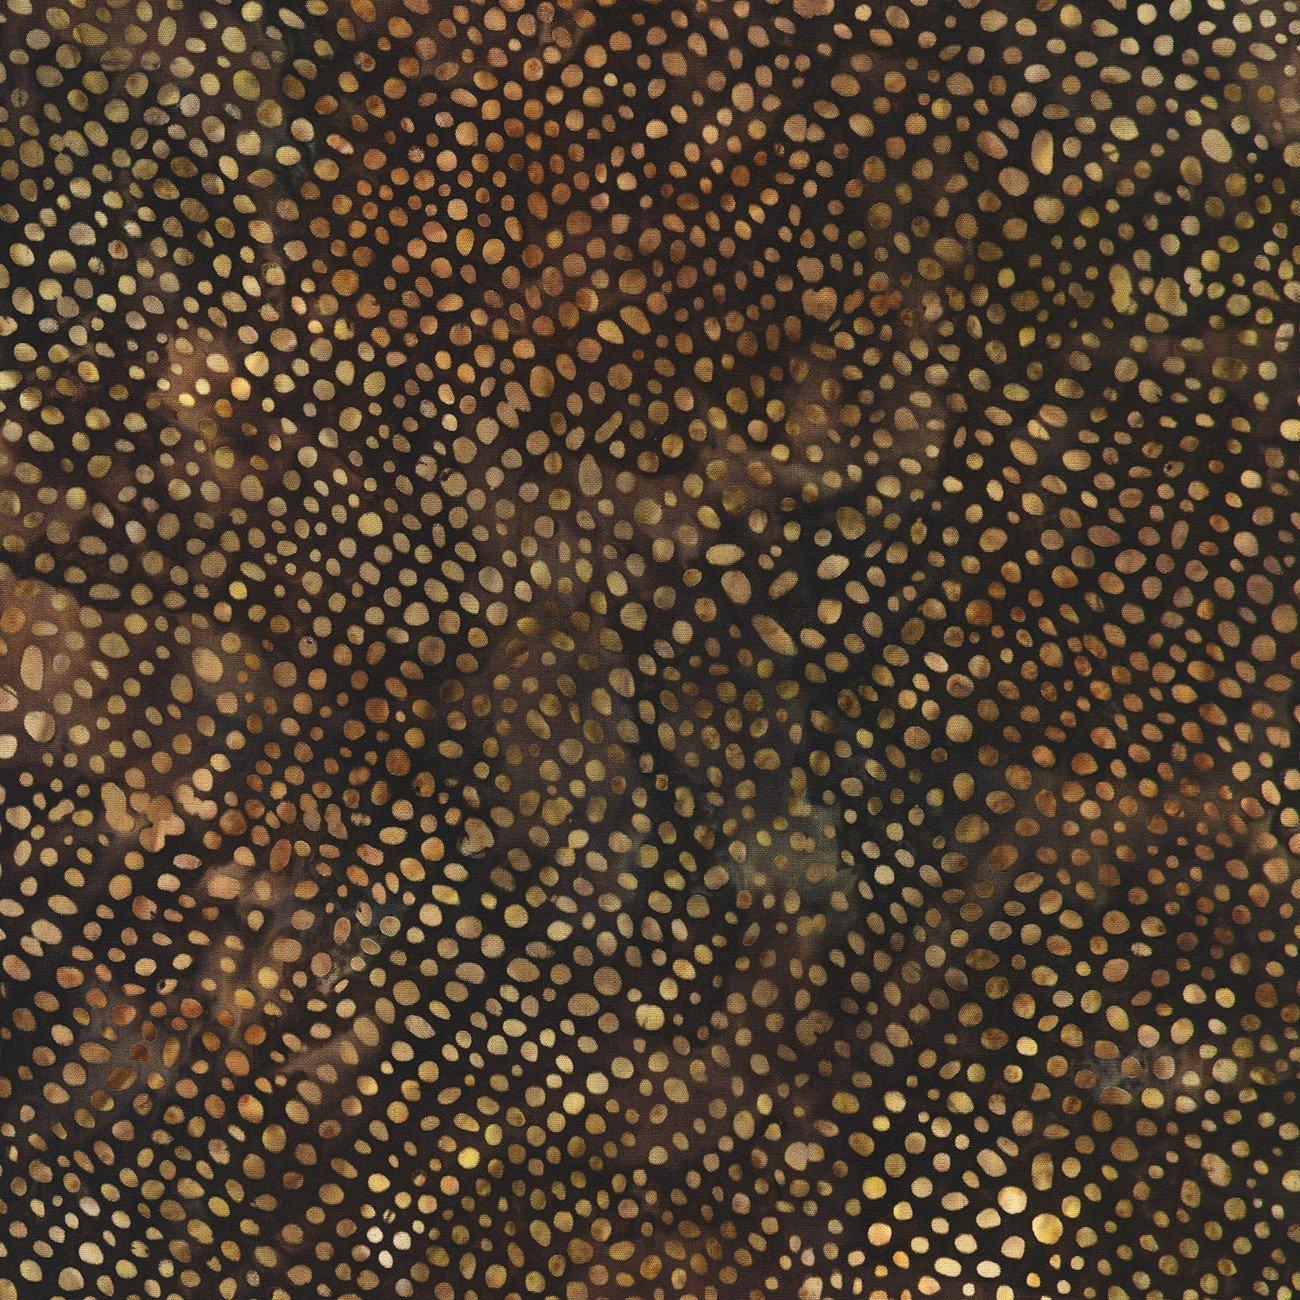 Serengeti Batiks - Dots - Mocha